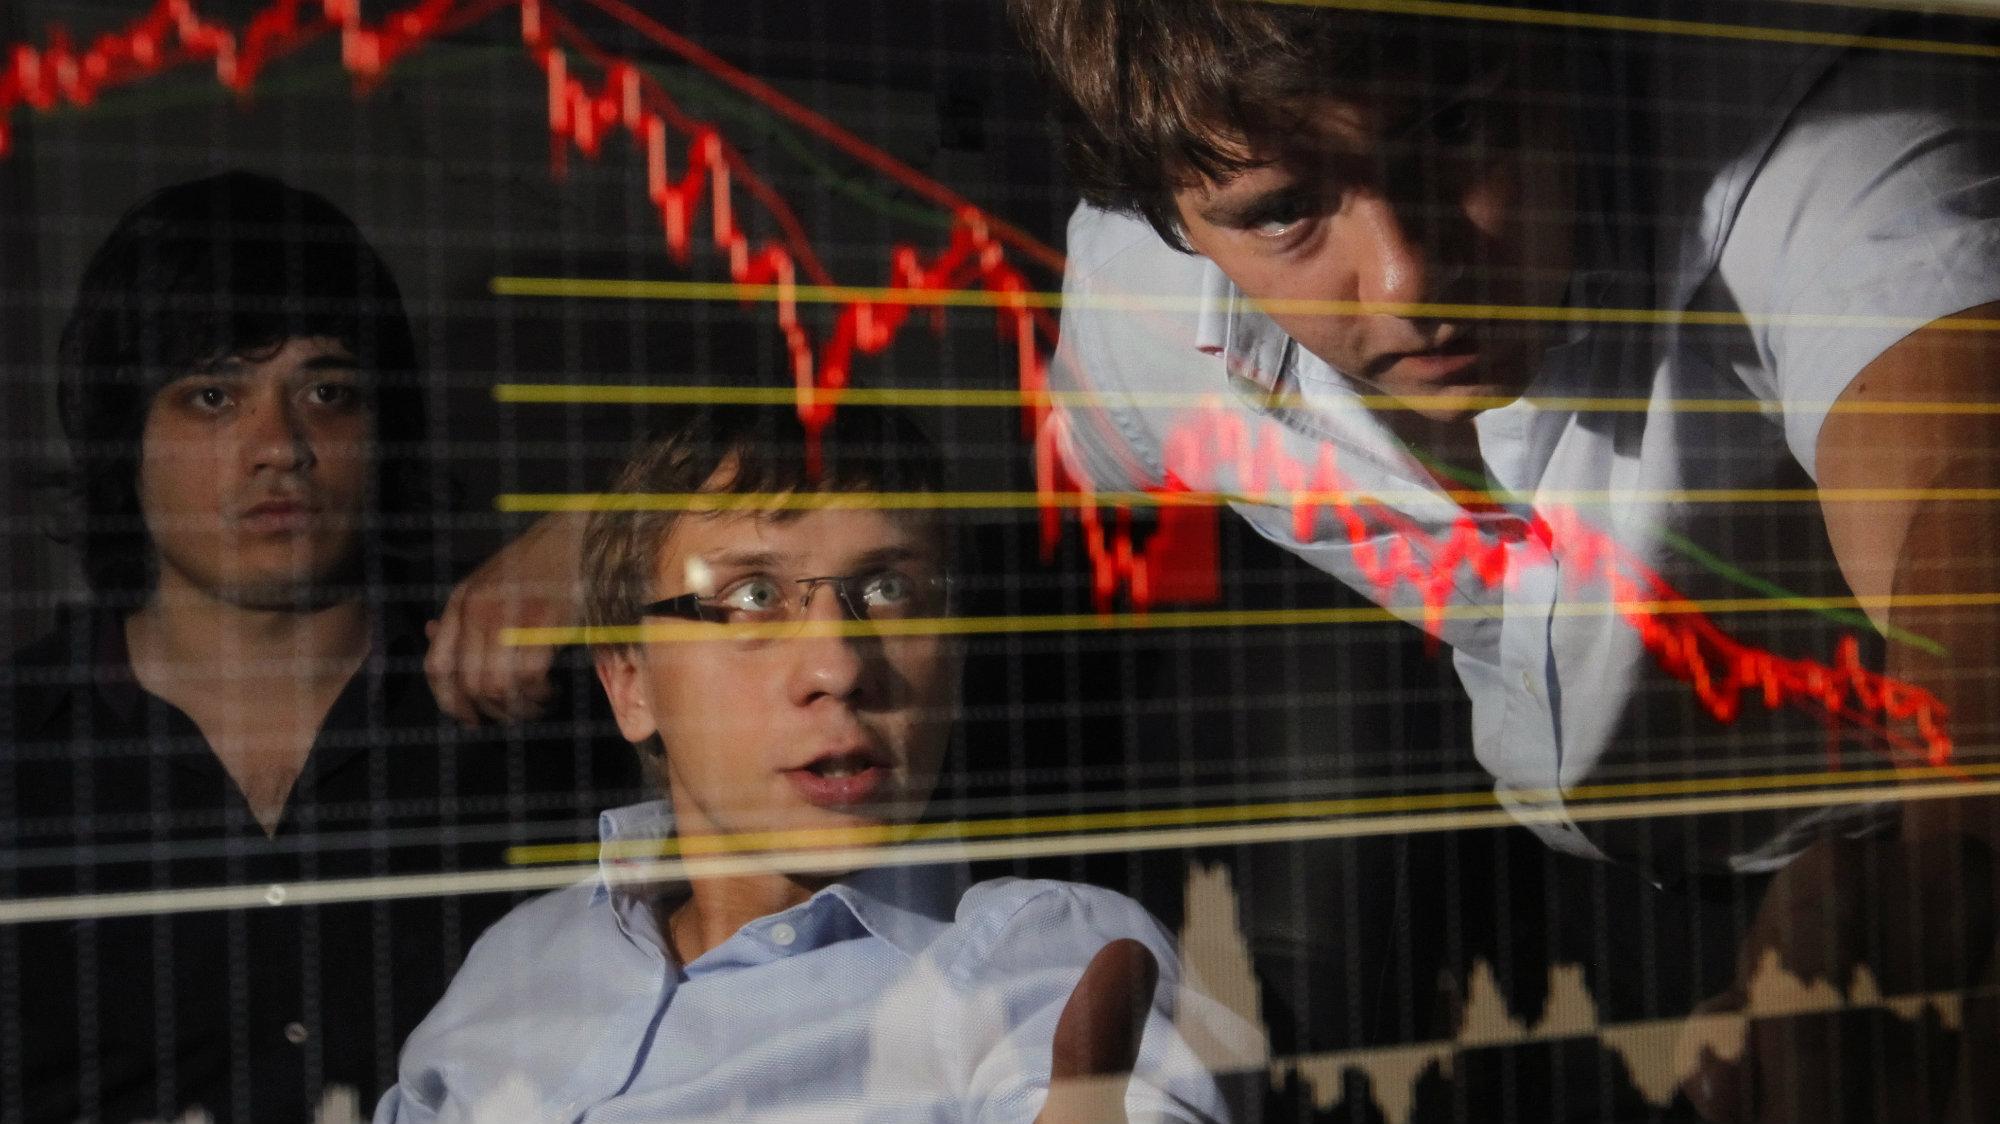 Traders looking at a screen.